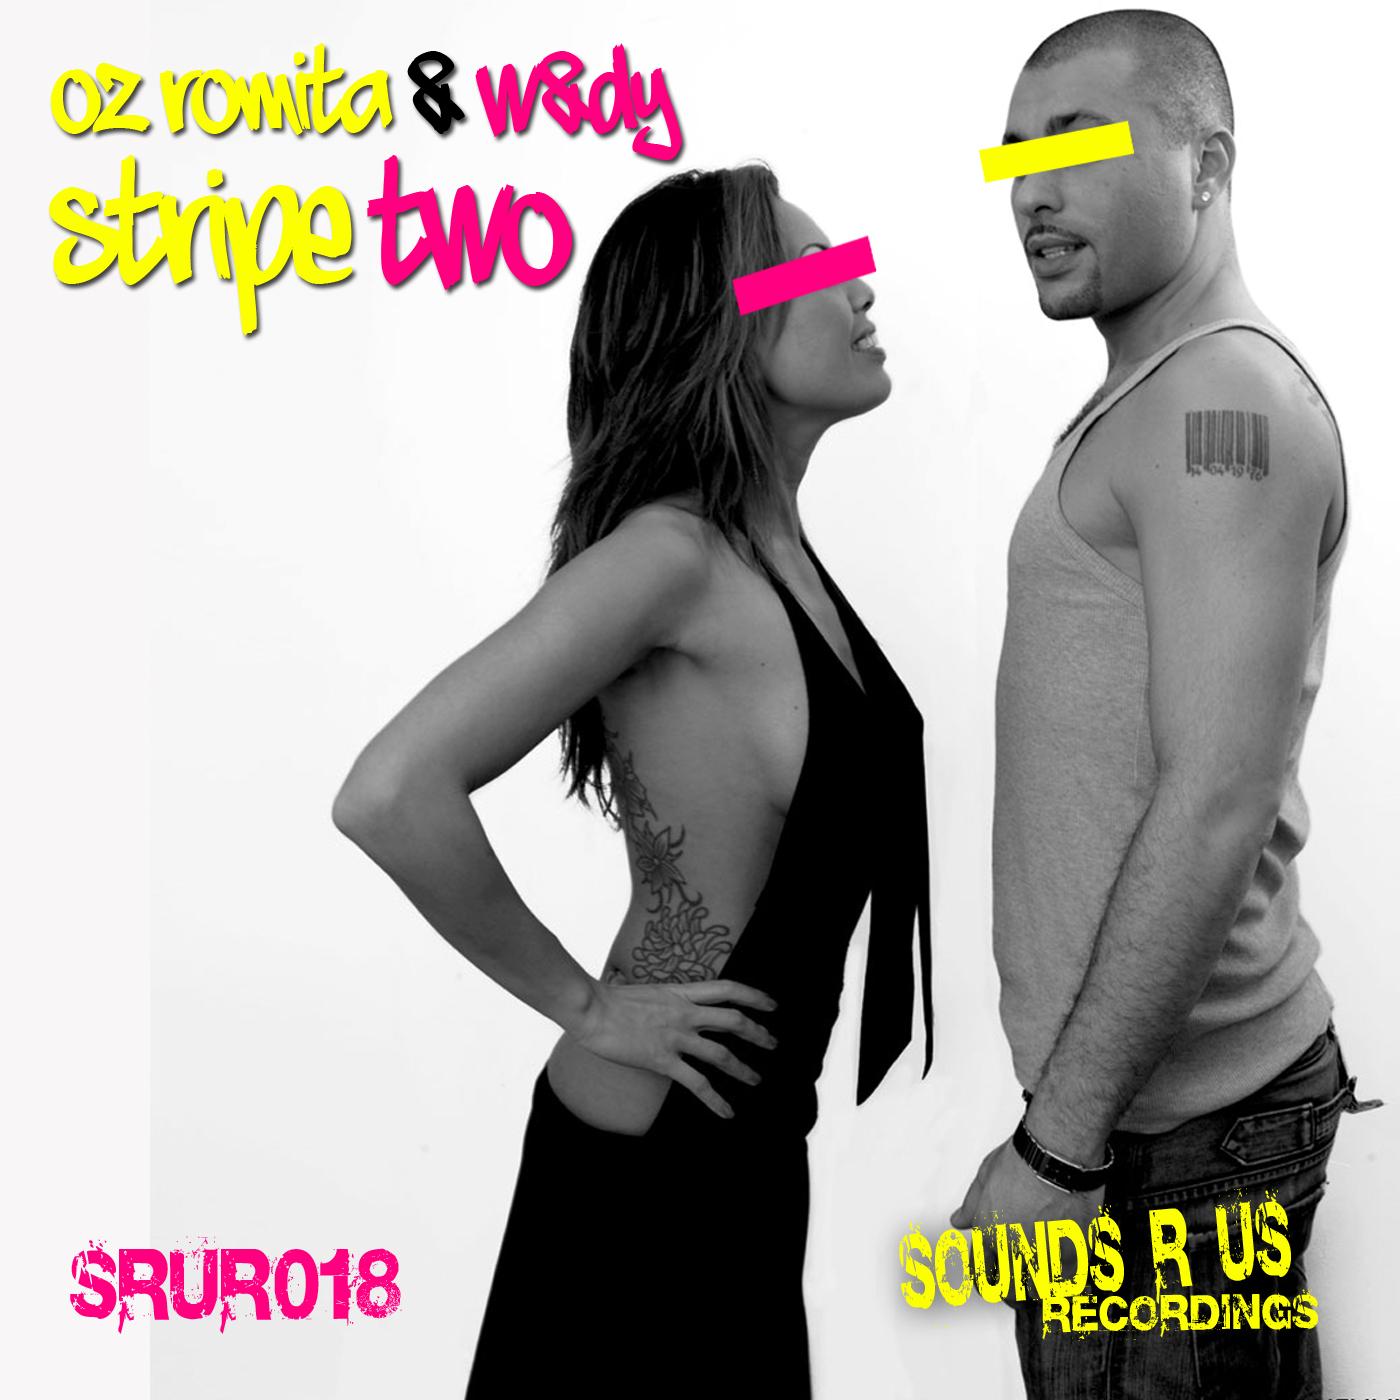 SRUR018 - Oz Romita & W&DY